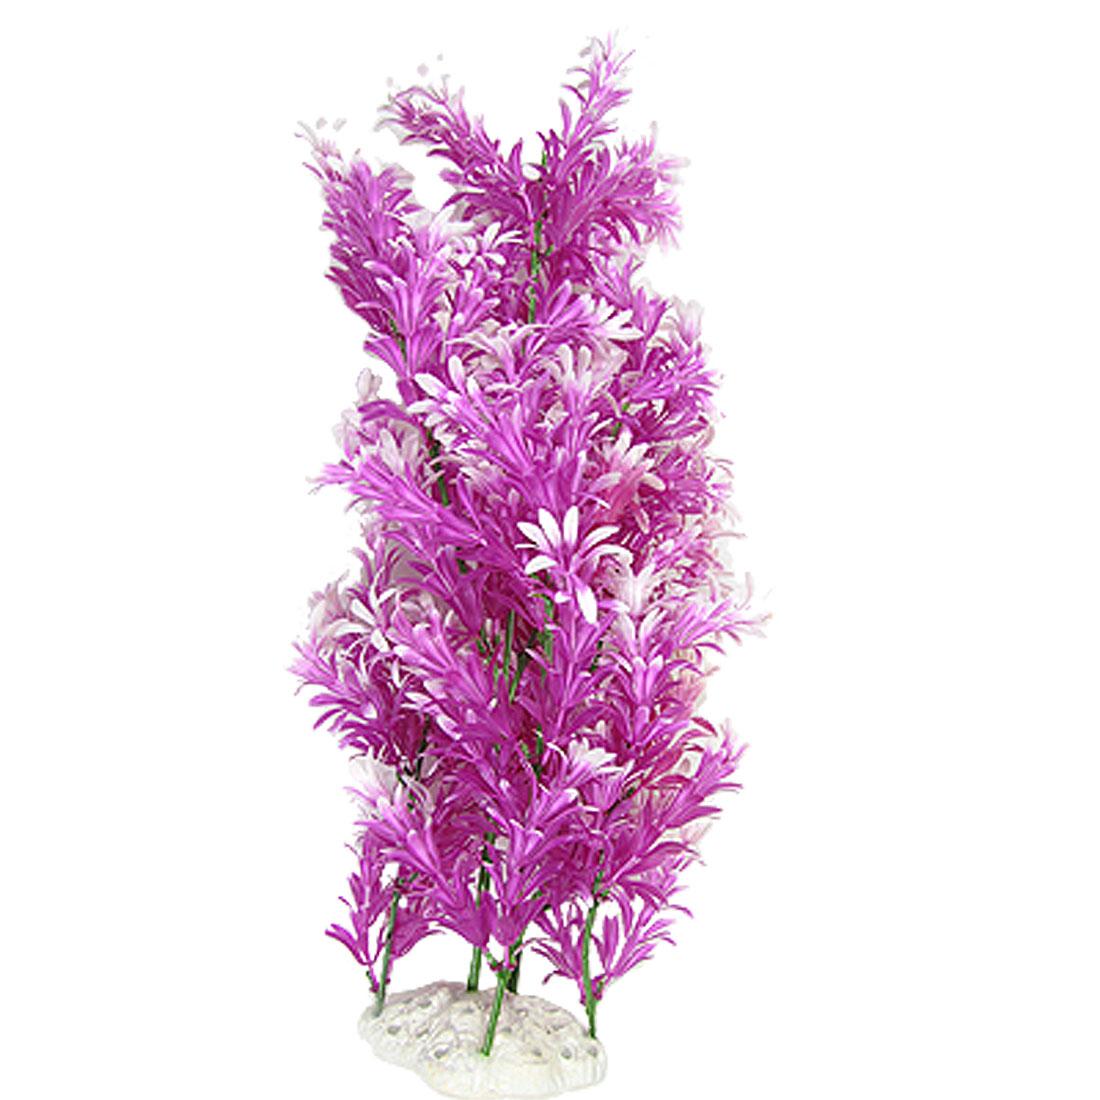 Ceramic Base Plastic Ornament Plant Purple for Fish Tank